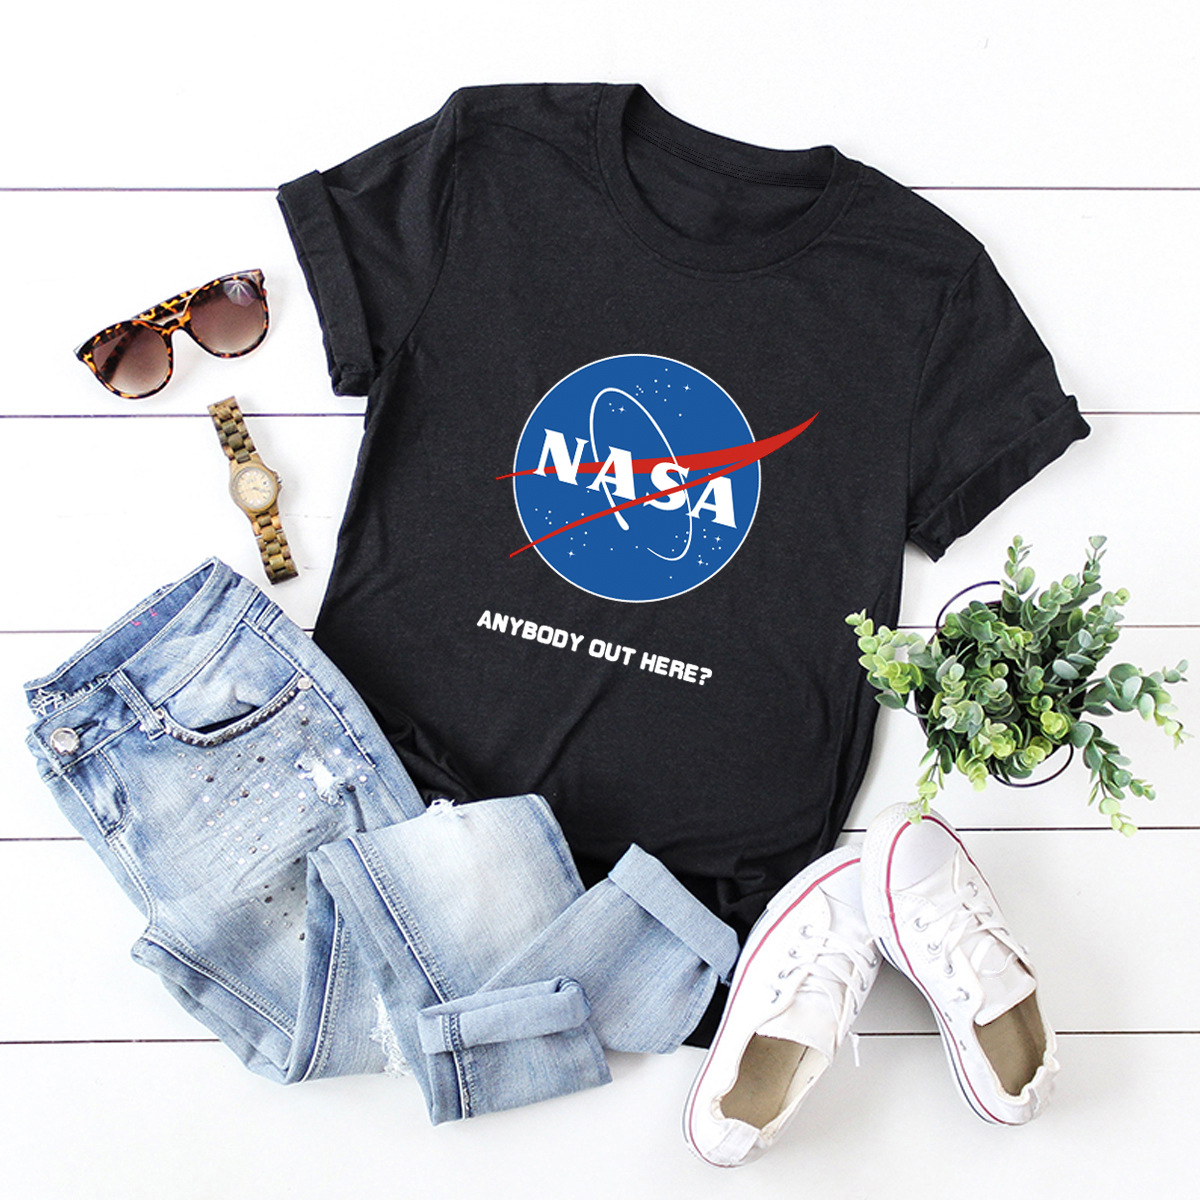 women's comfortable short-sleeved tops T-shirt NASA space NSSN1453